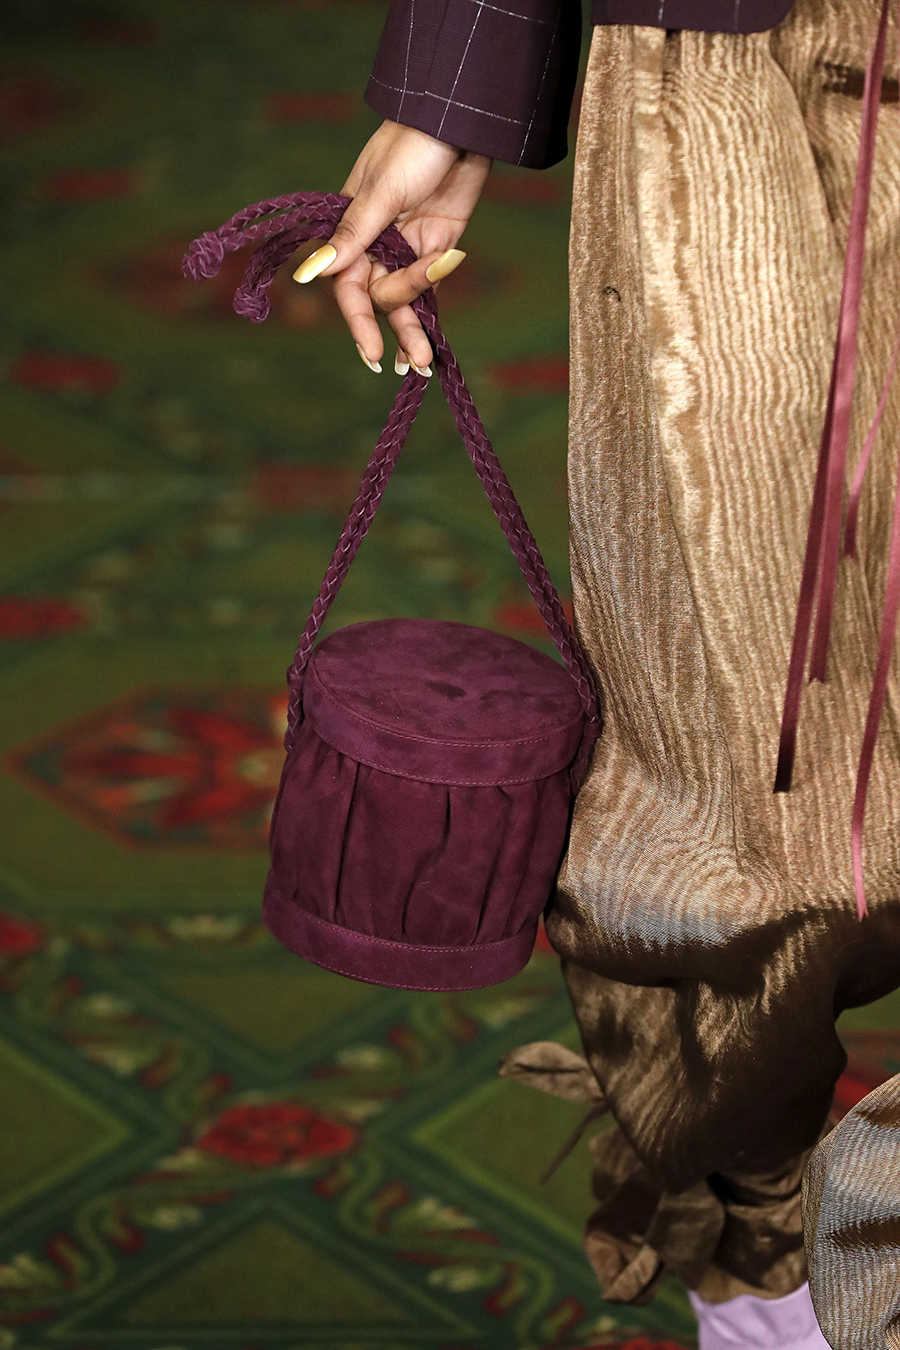 модная осень зима 2020 2021 круглая жесткая форма барабан шкатулка фиолетовая бордо замша